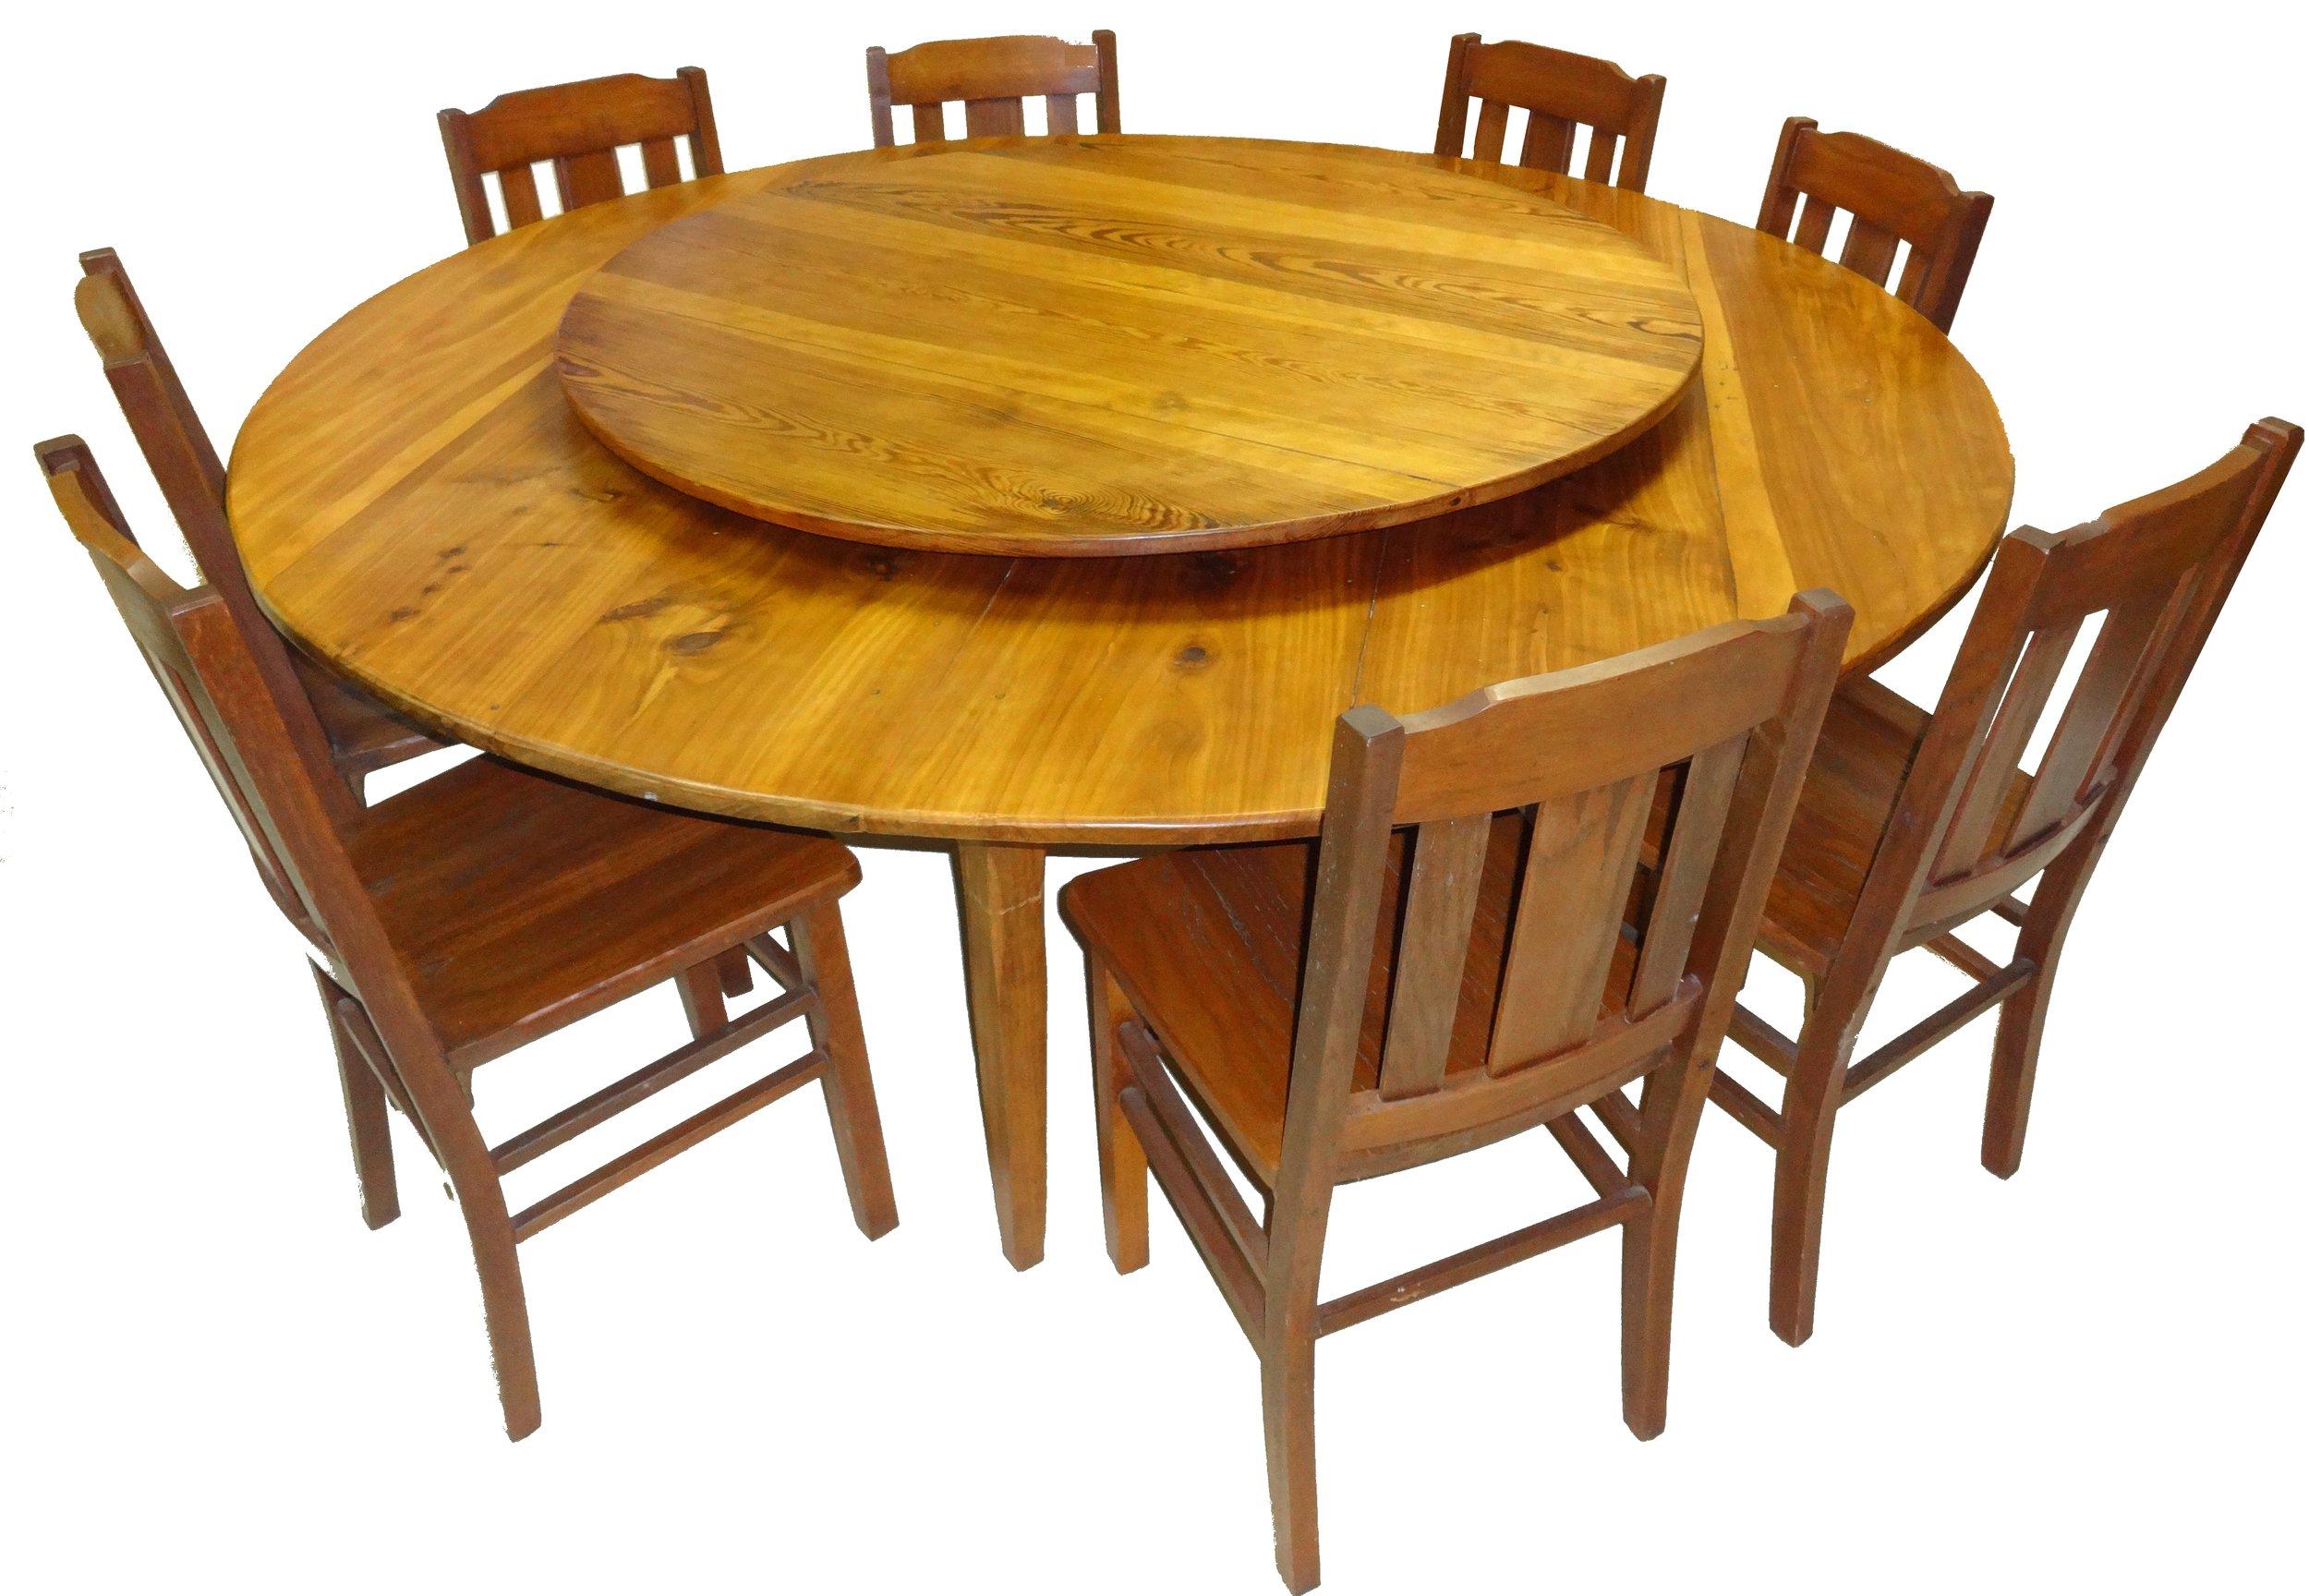 Photos Table And Pillow Weirdmonger.Com